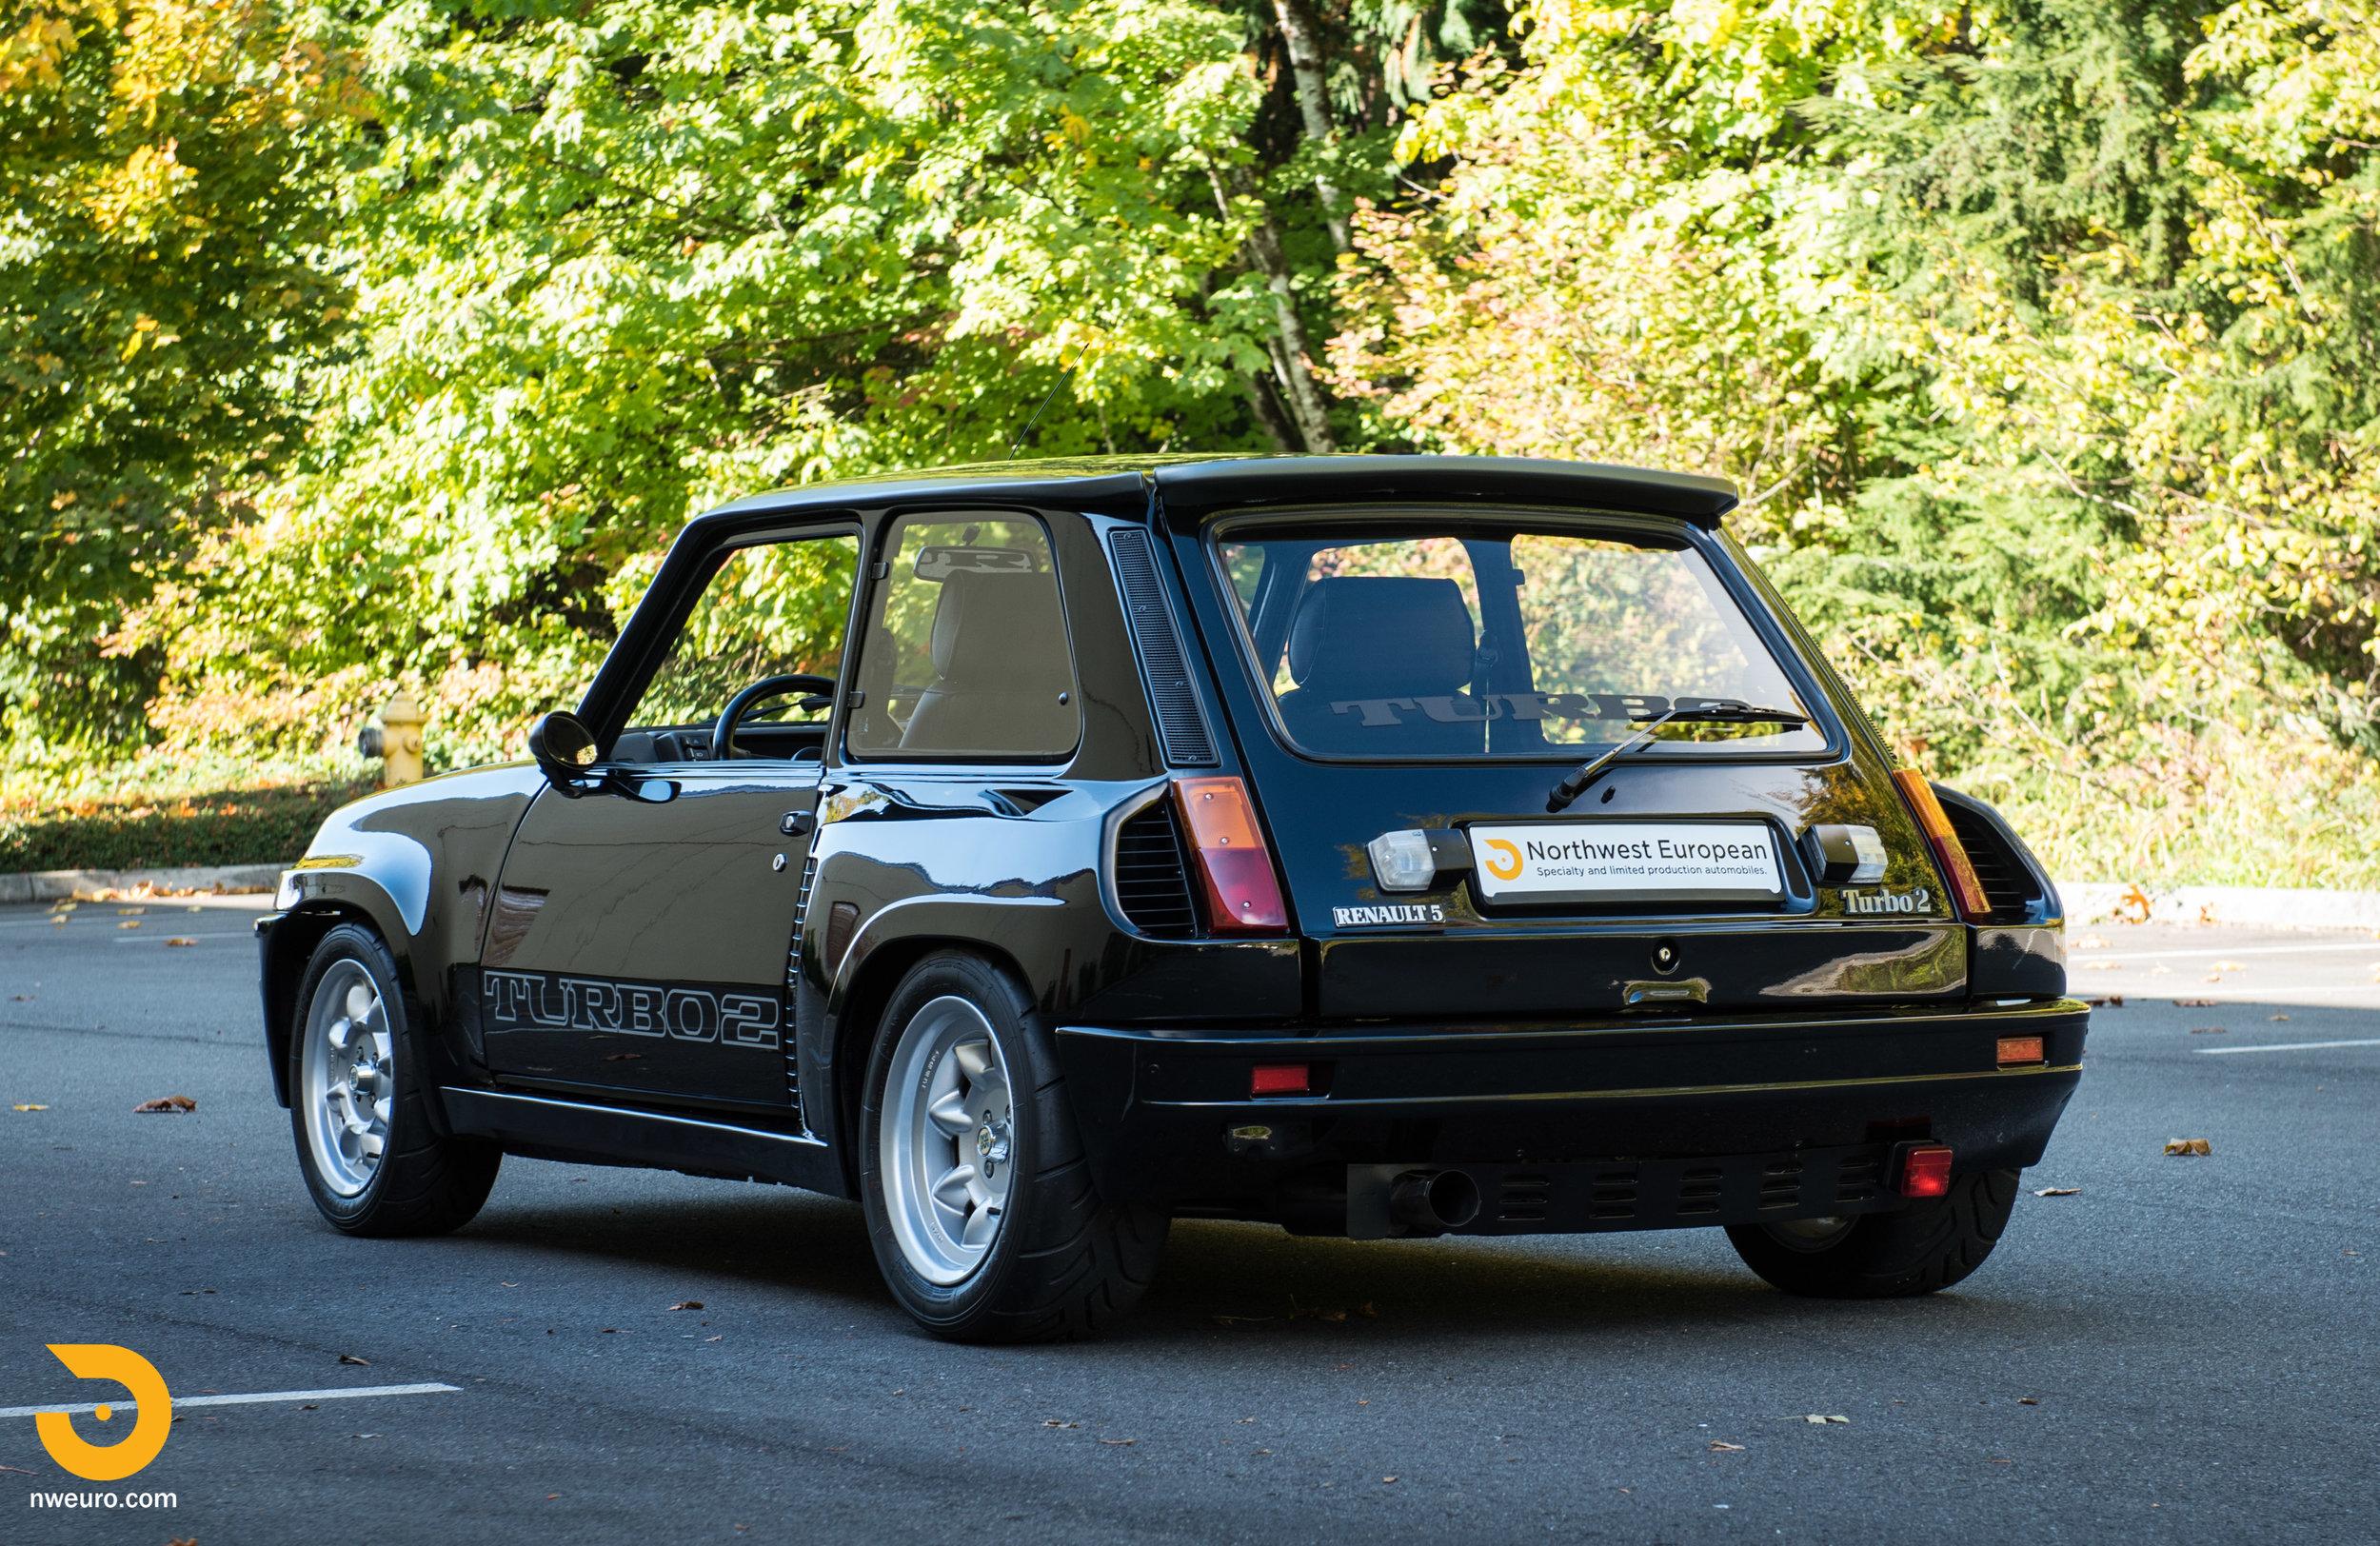 1983 Renault R5 Turbo 2 Black-50.jpg